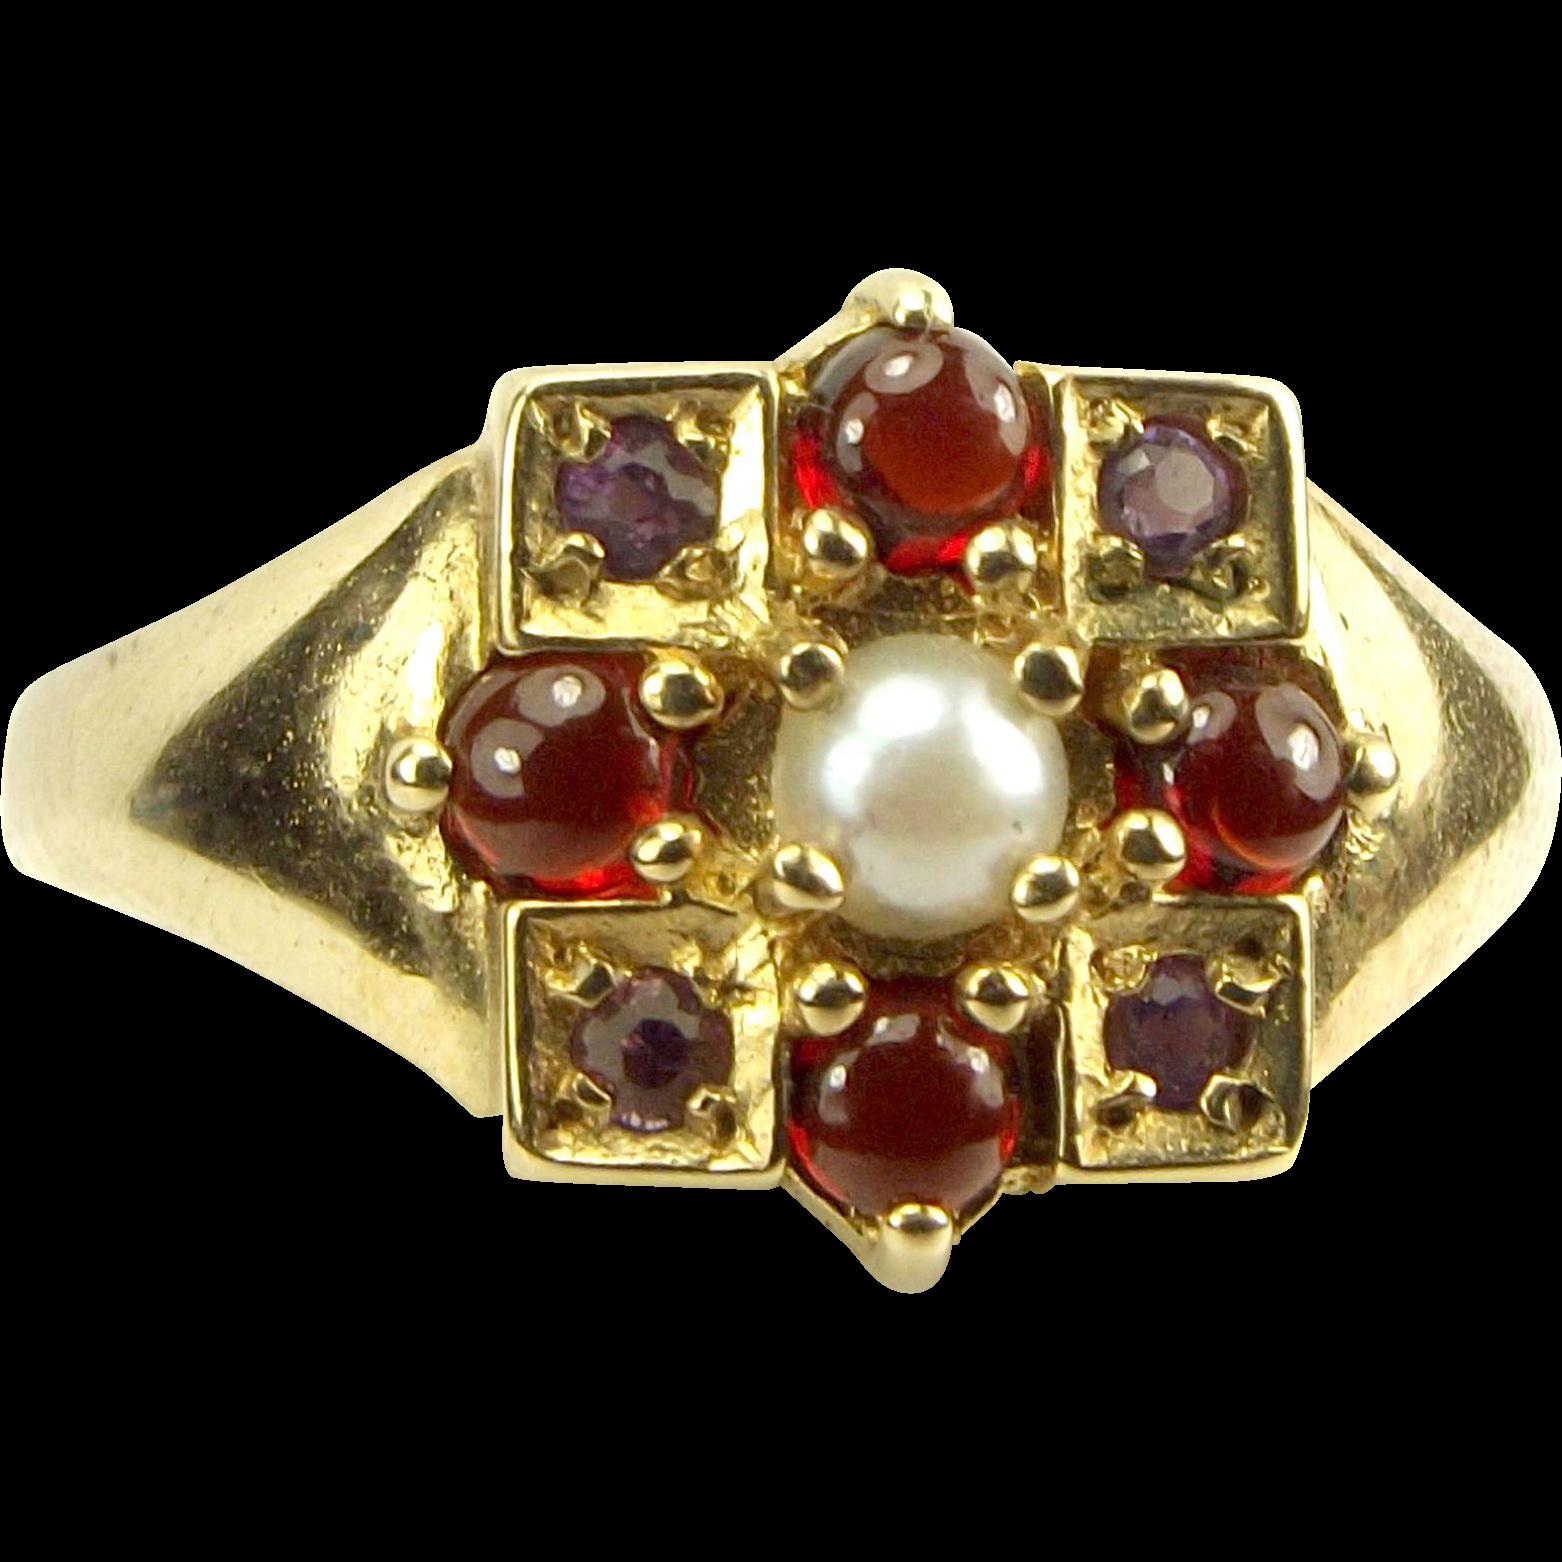 Vintage 9ct Gold RING Pearl, Garnet & Amethyst